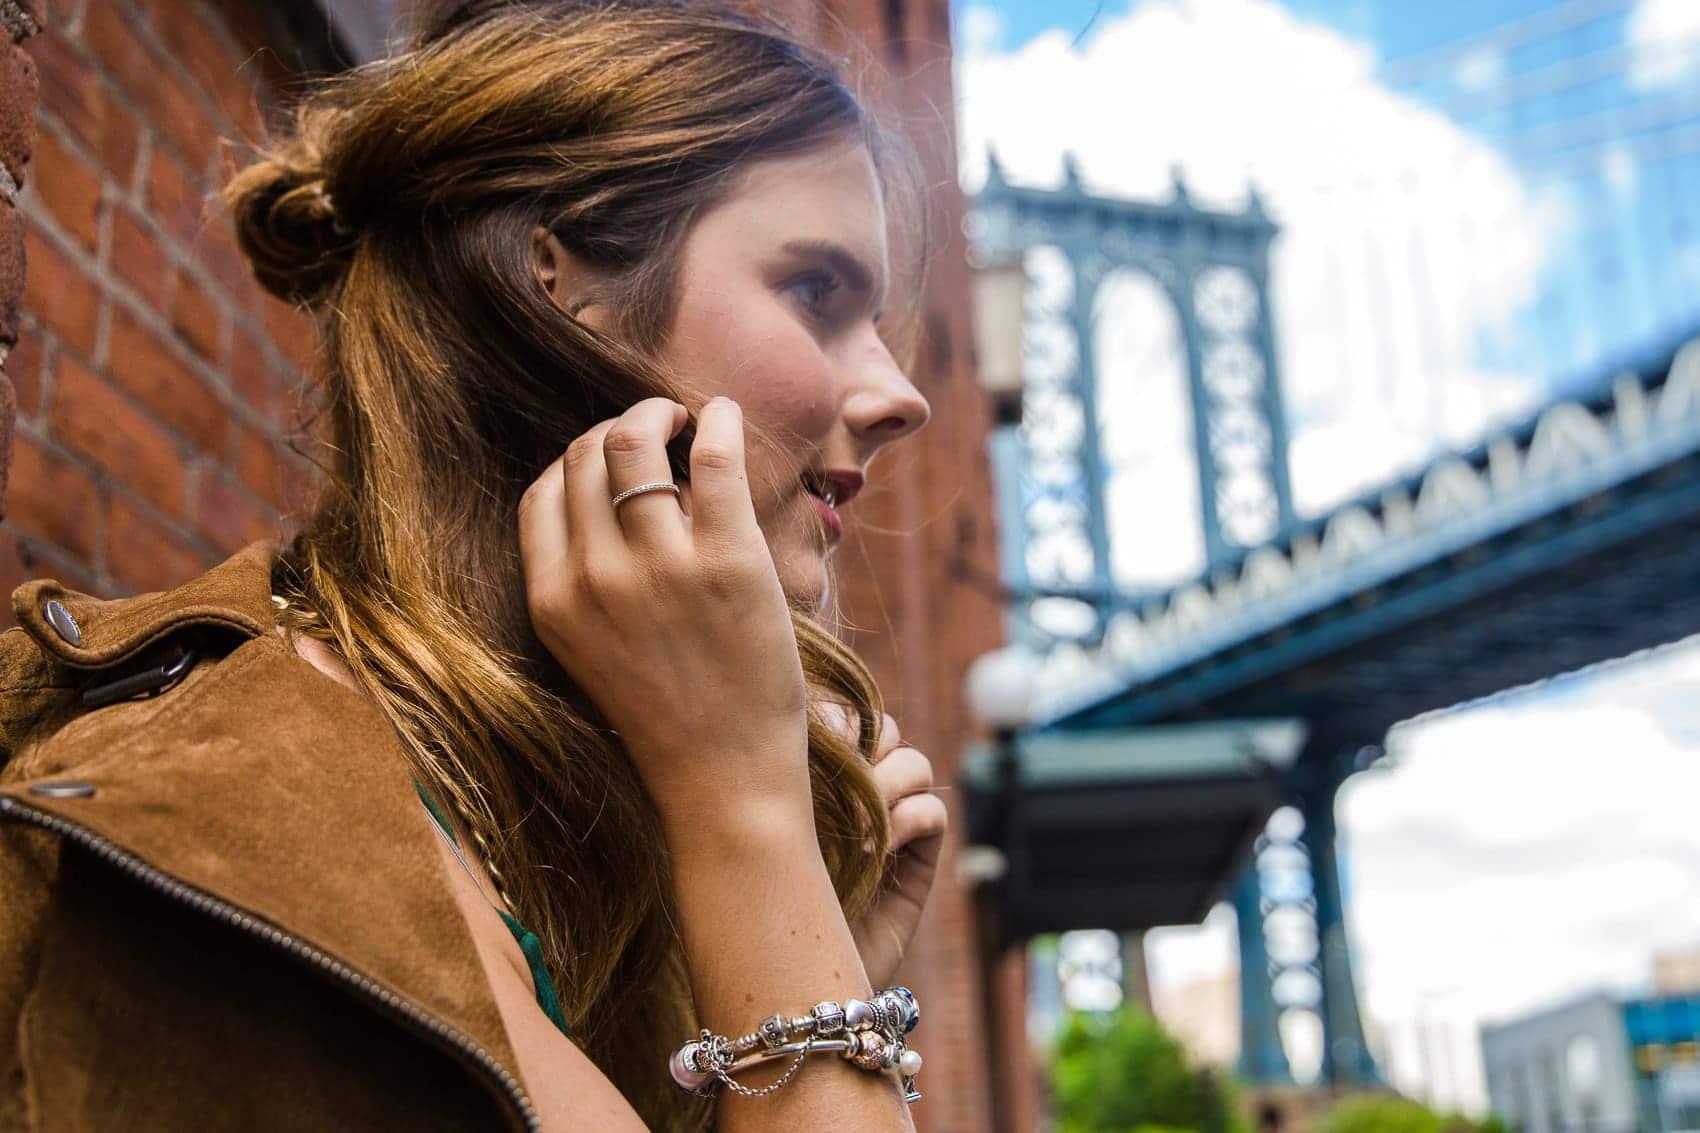 Brooklyn Dumbo Streetstyle - DIE Location für alle Gossip Girl Fans